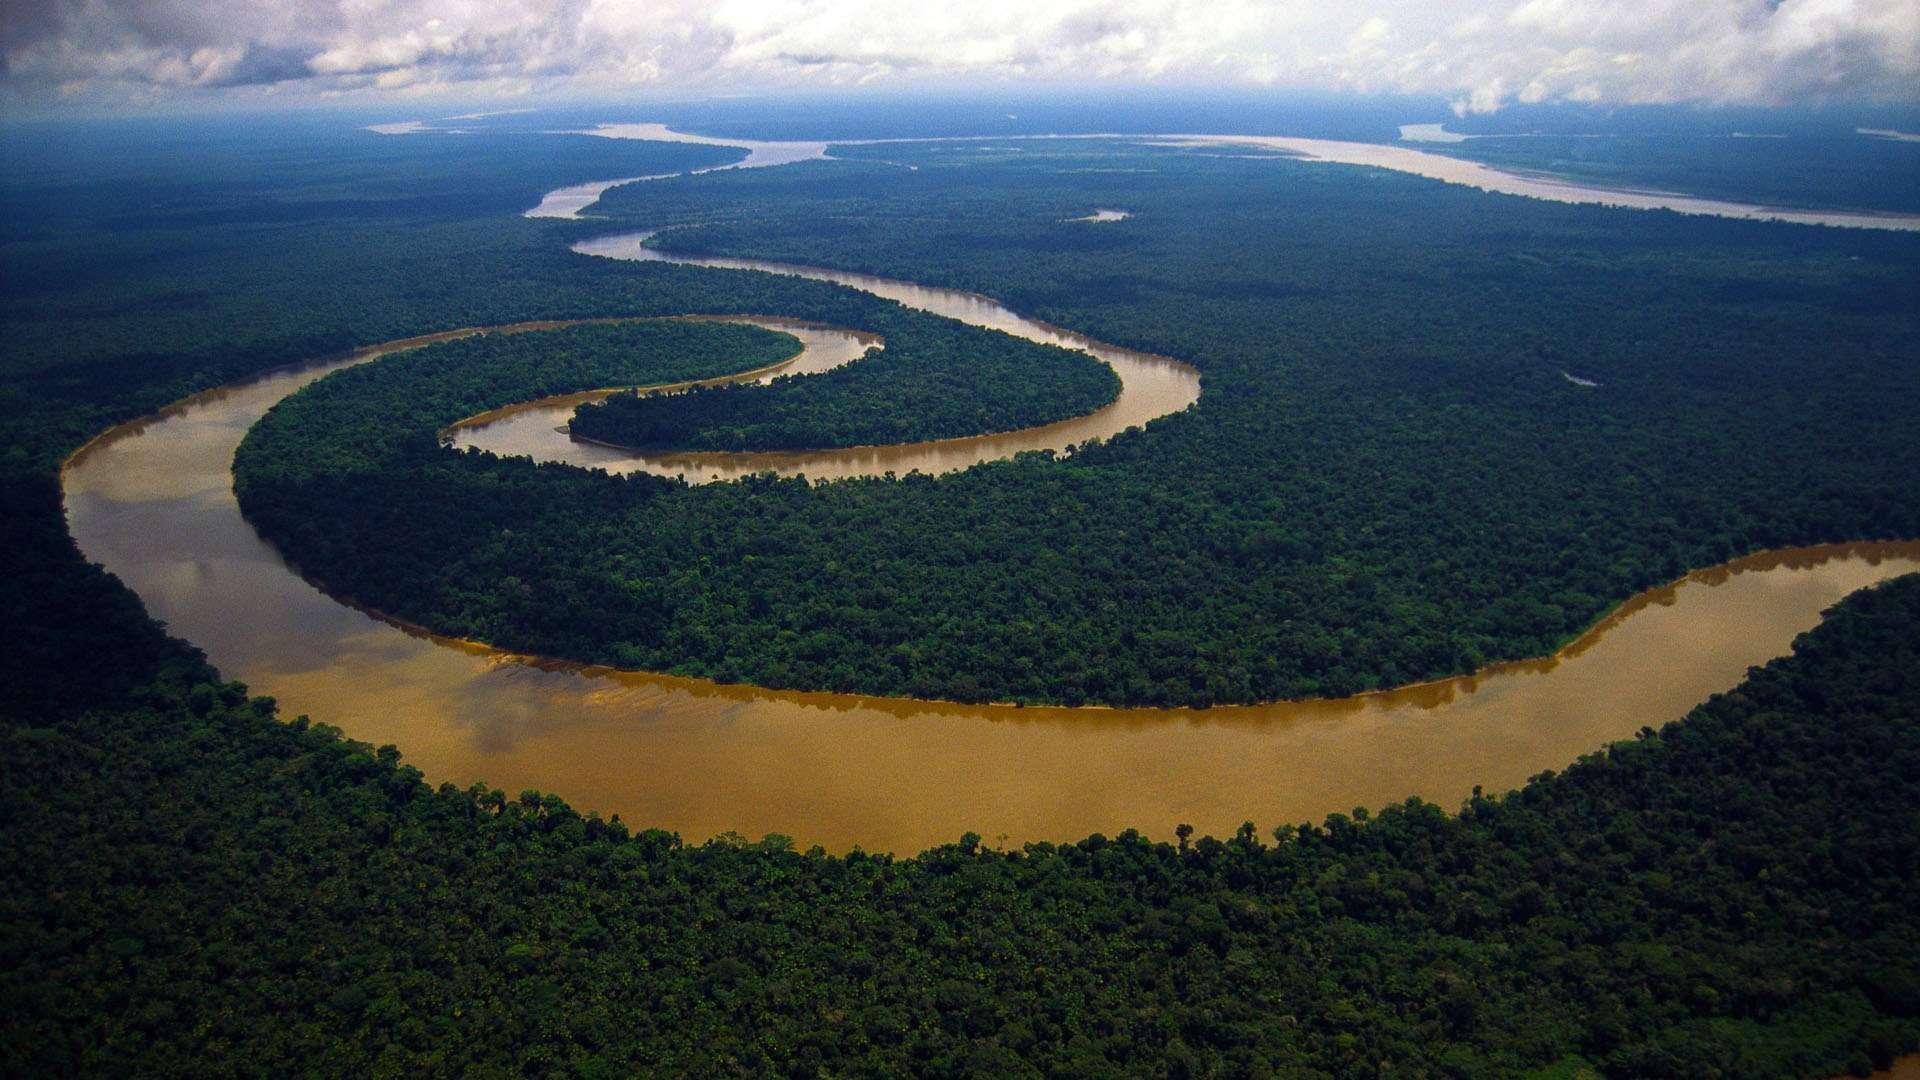 так картинки амазонок рек этой странице найдете